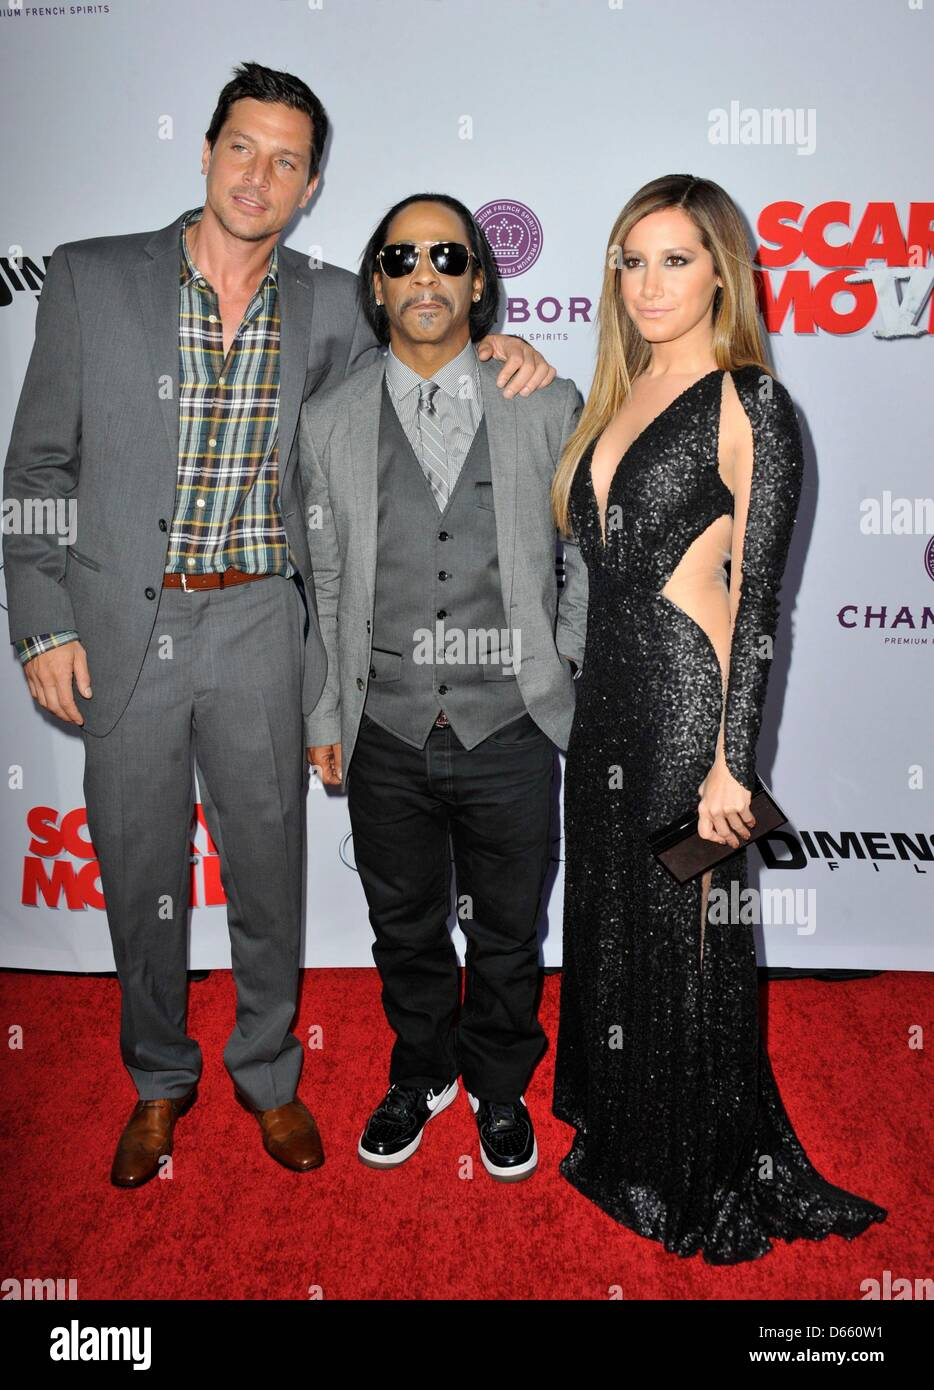 Hollywood Los Angeles Ca Usa April 11 2013 Simon Rex Katt Stock Photo 55451453 Alamy